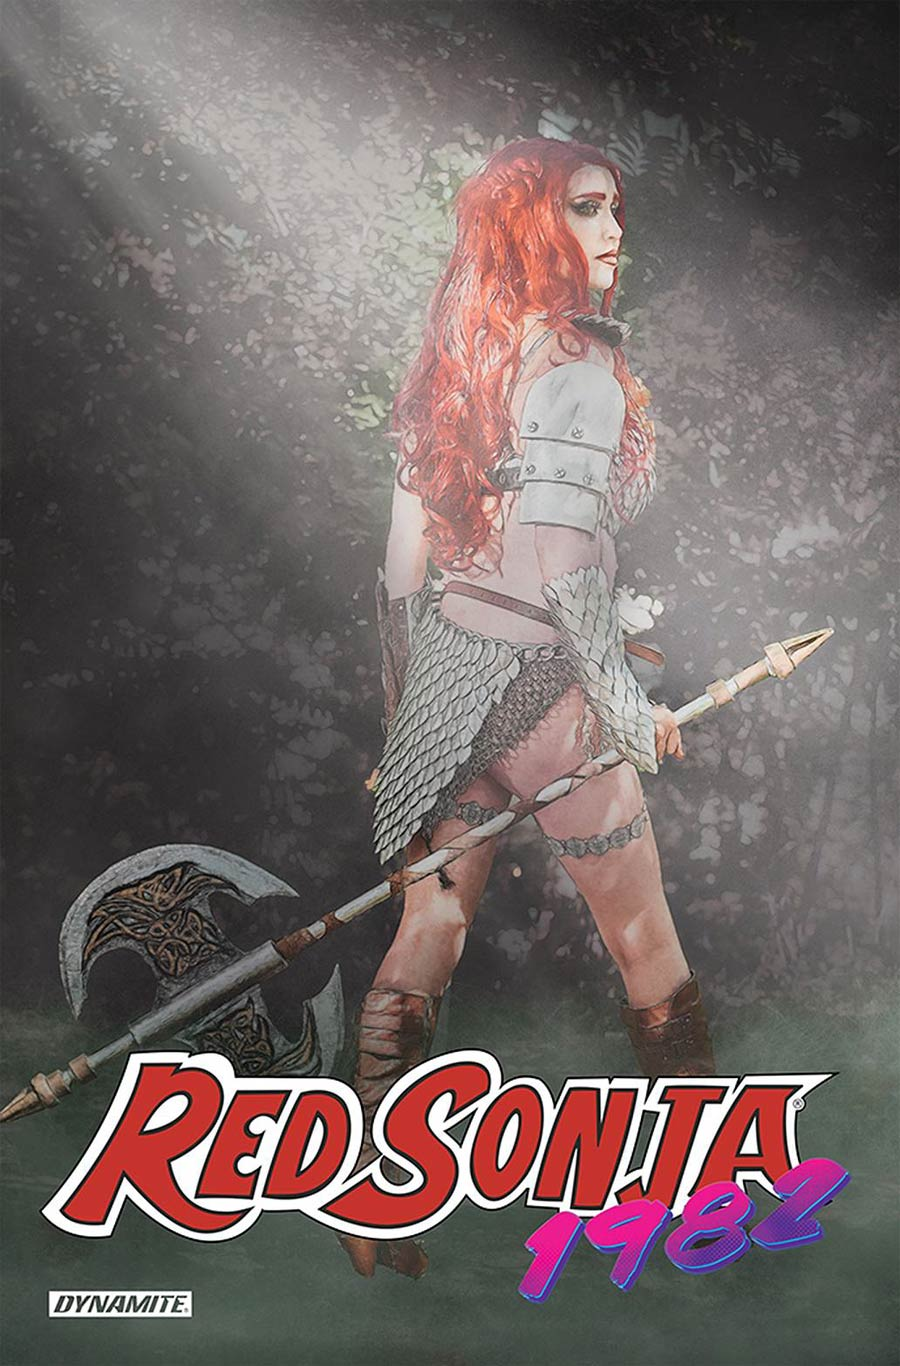 Red Sonja 1982 #1 (One Shot) Cover C Variant Alyssa Stargoddess Cosplay Photo Cover